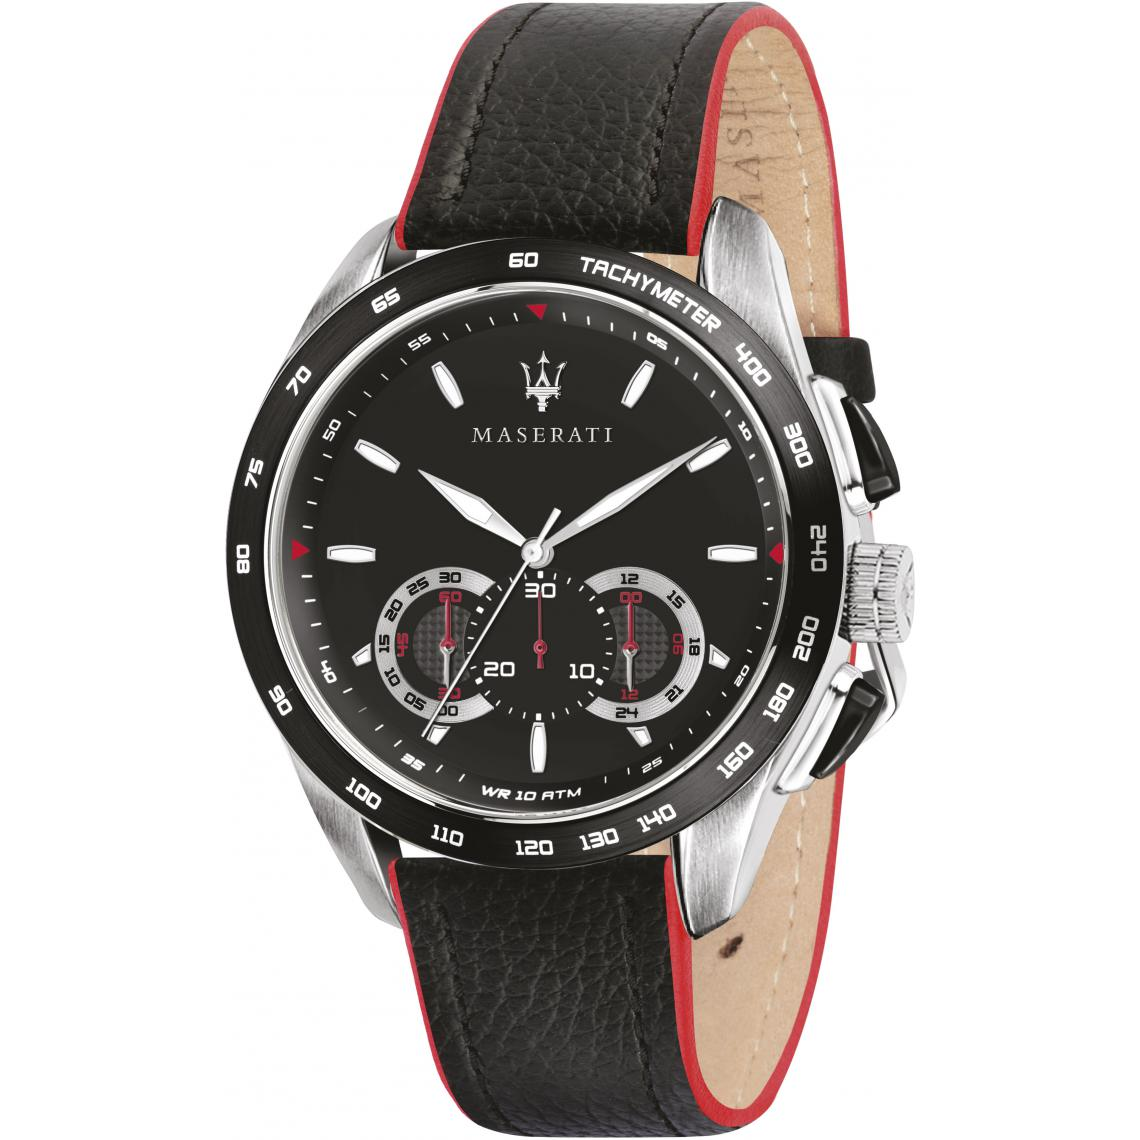 Montre TRAGUARDO R8871612028 - Montre Chronographe Cuir - Maserati - Modalova